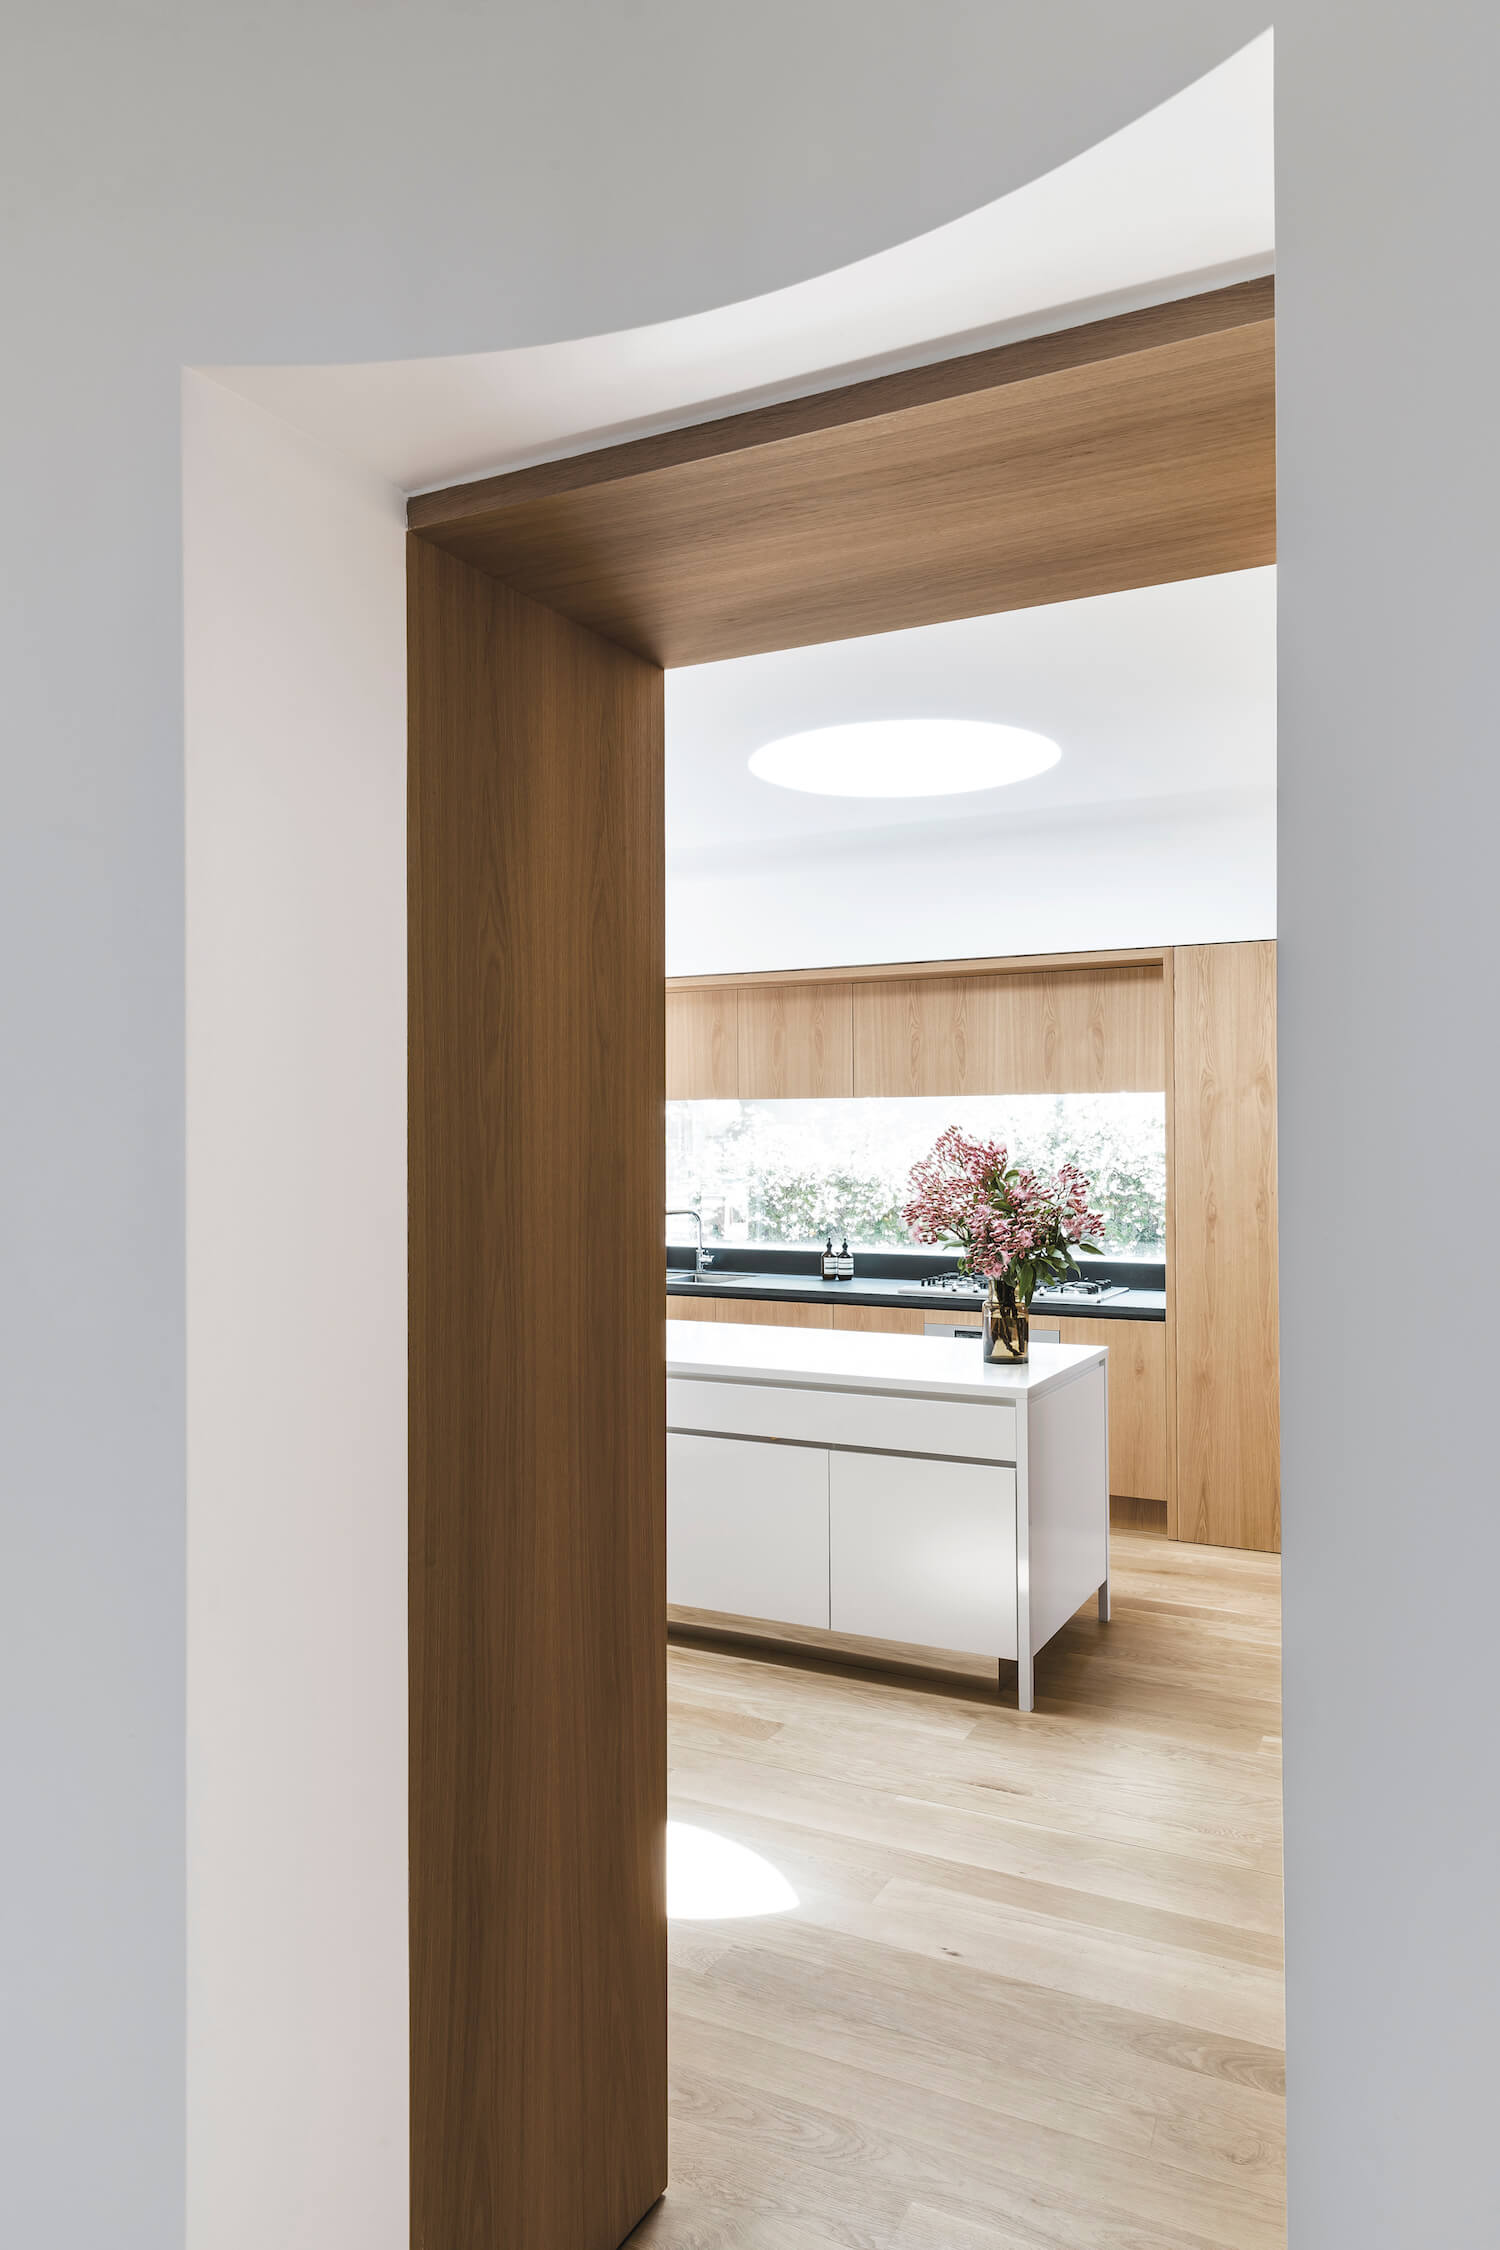 est living australian interiors bellevue hill house madeleine blanchfield architects 6